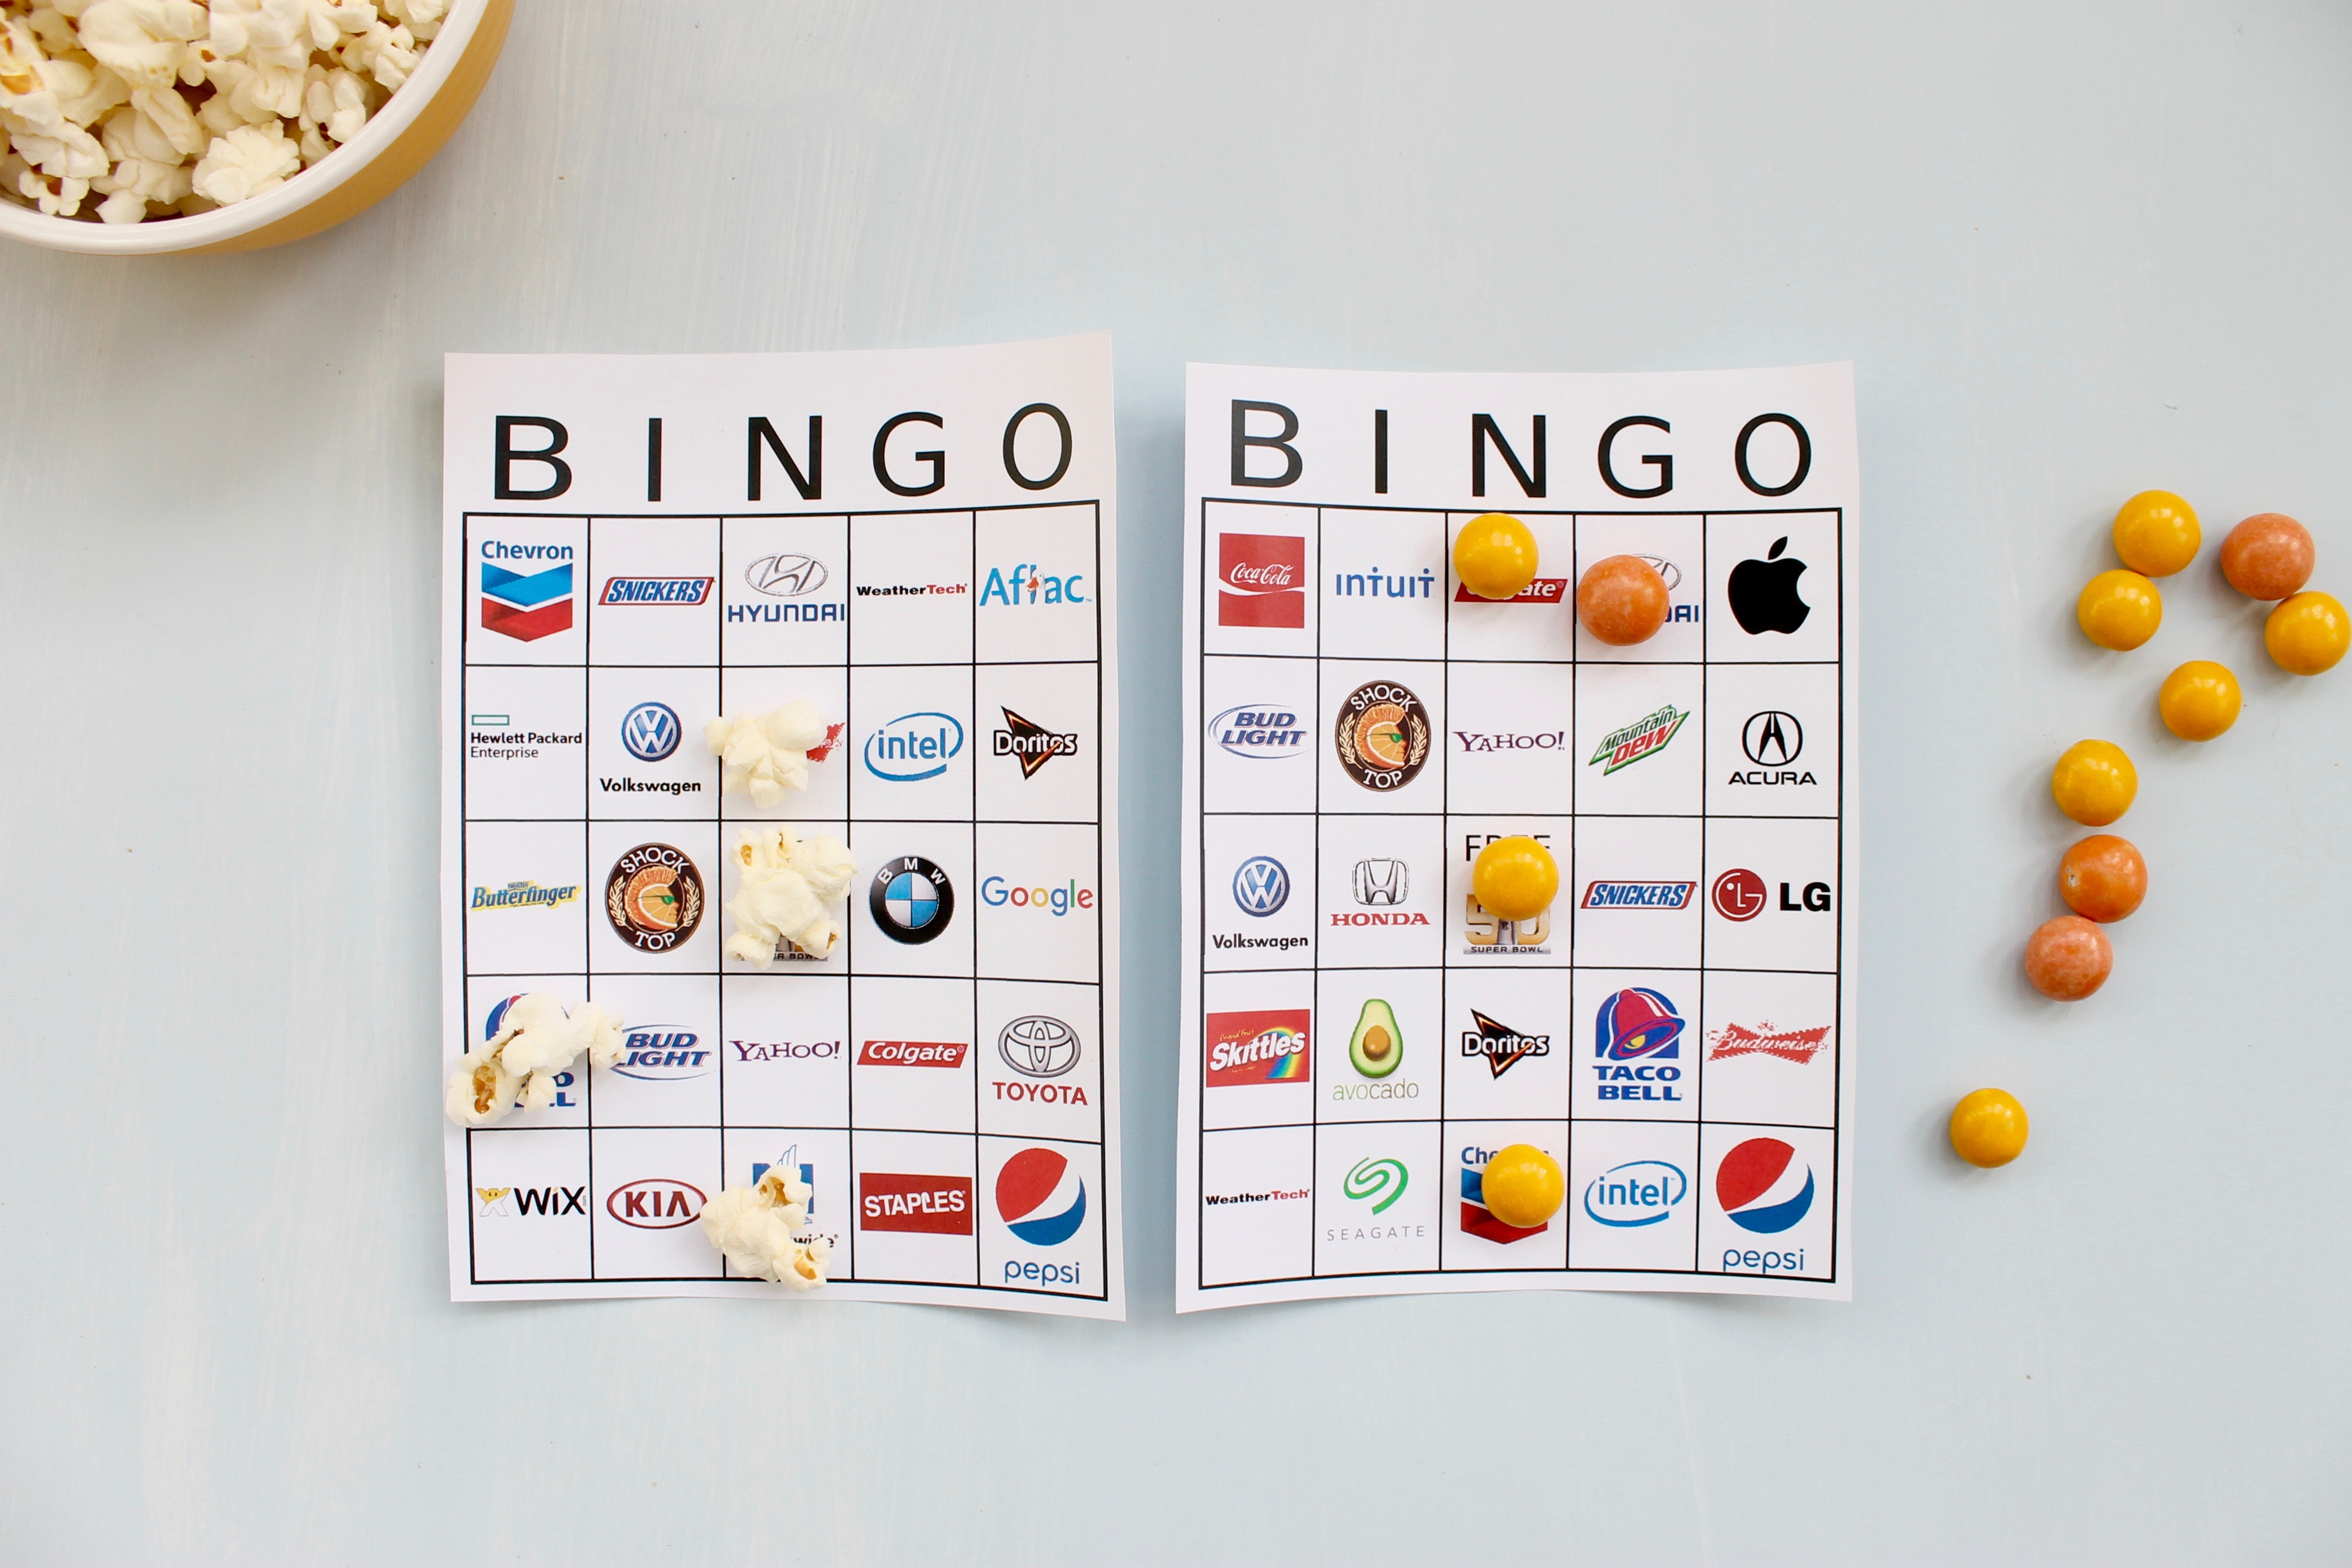 photo regarding Printable Super Bowl Bingo Cards named Printable Tremendous Bowl 50 Professional Bingo Playing cards - Had been Shifting